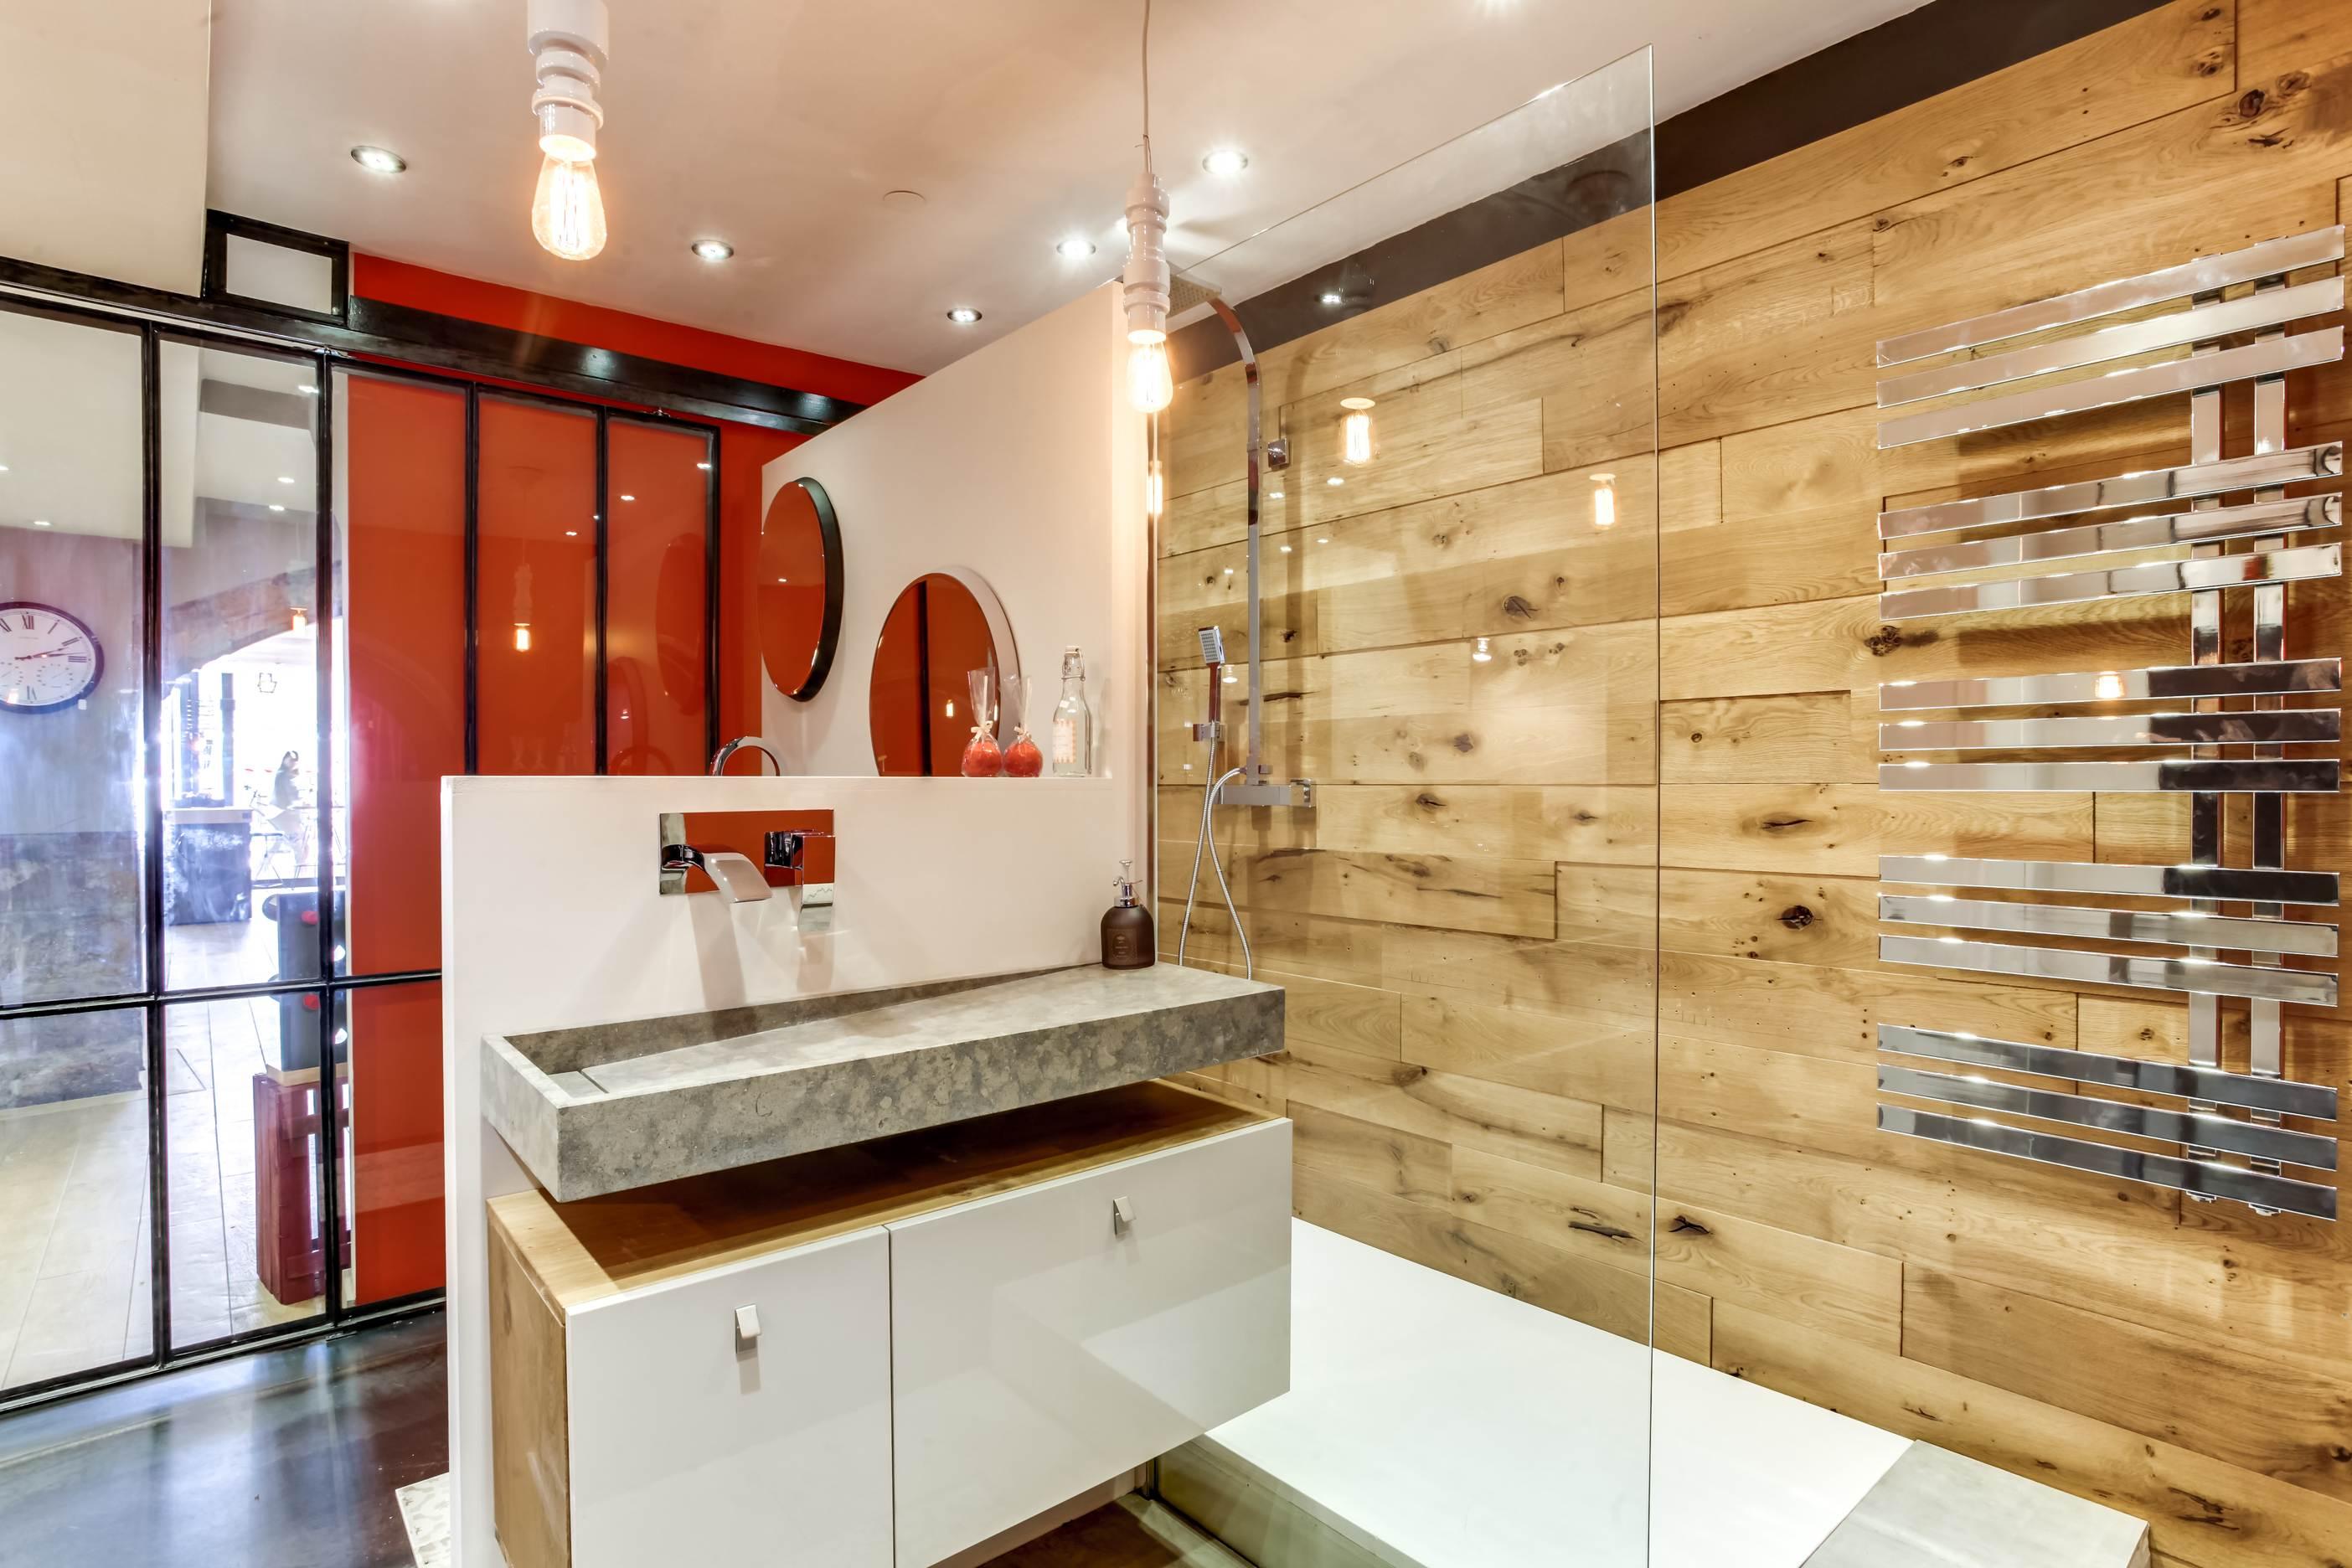 5 impressionnant showroom salle de bain photographie 2018 for Showroom salle de bain